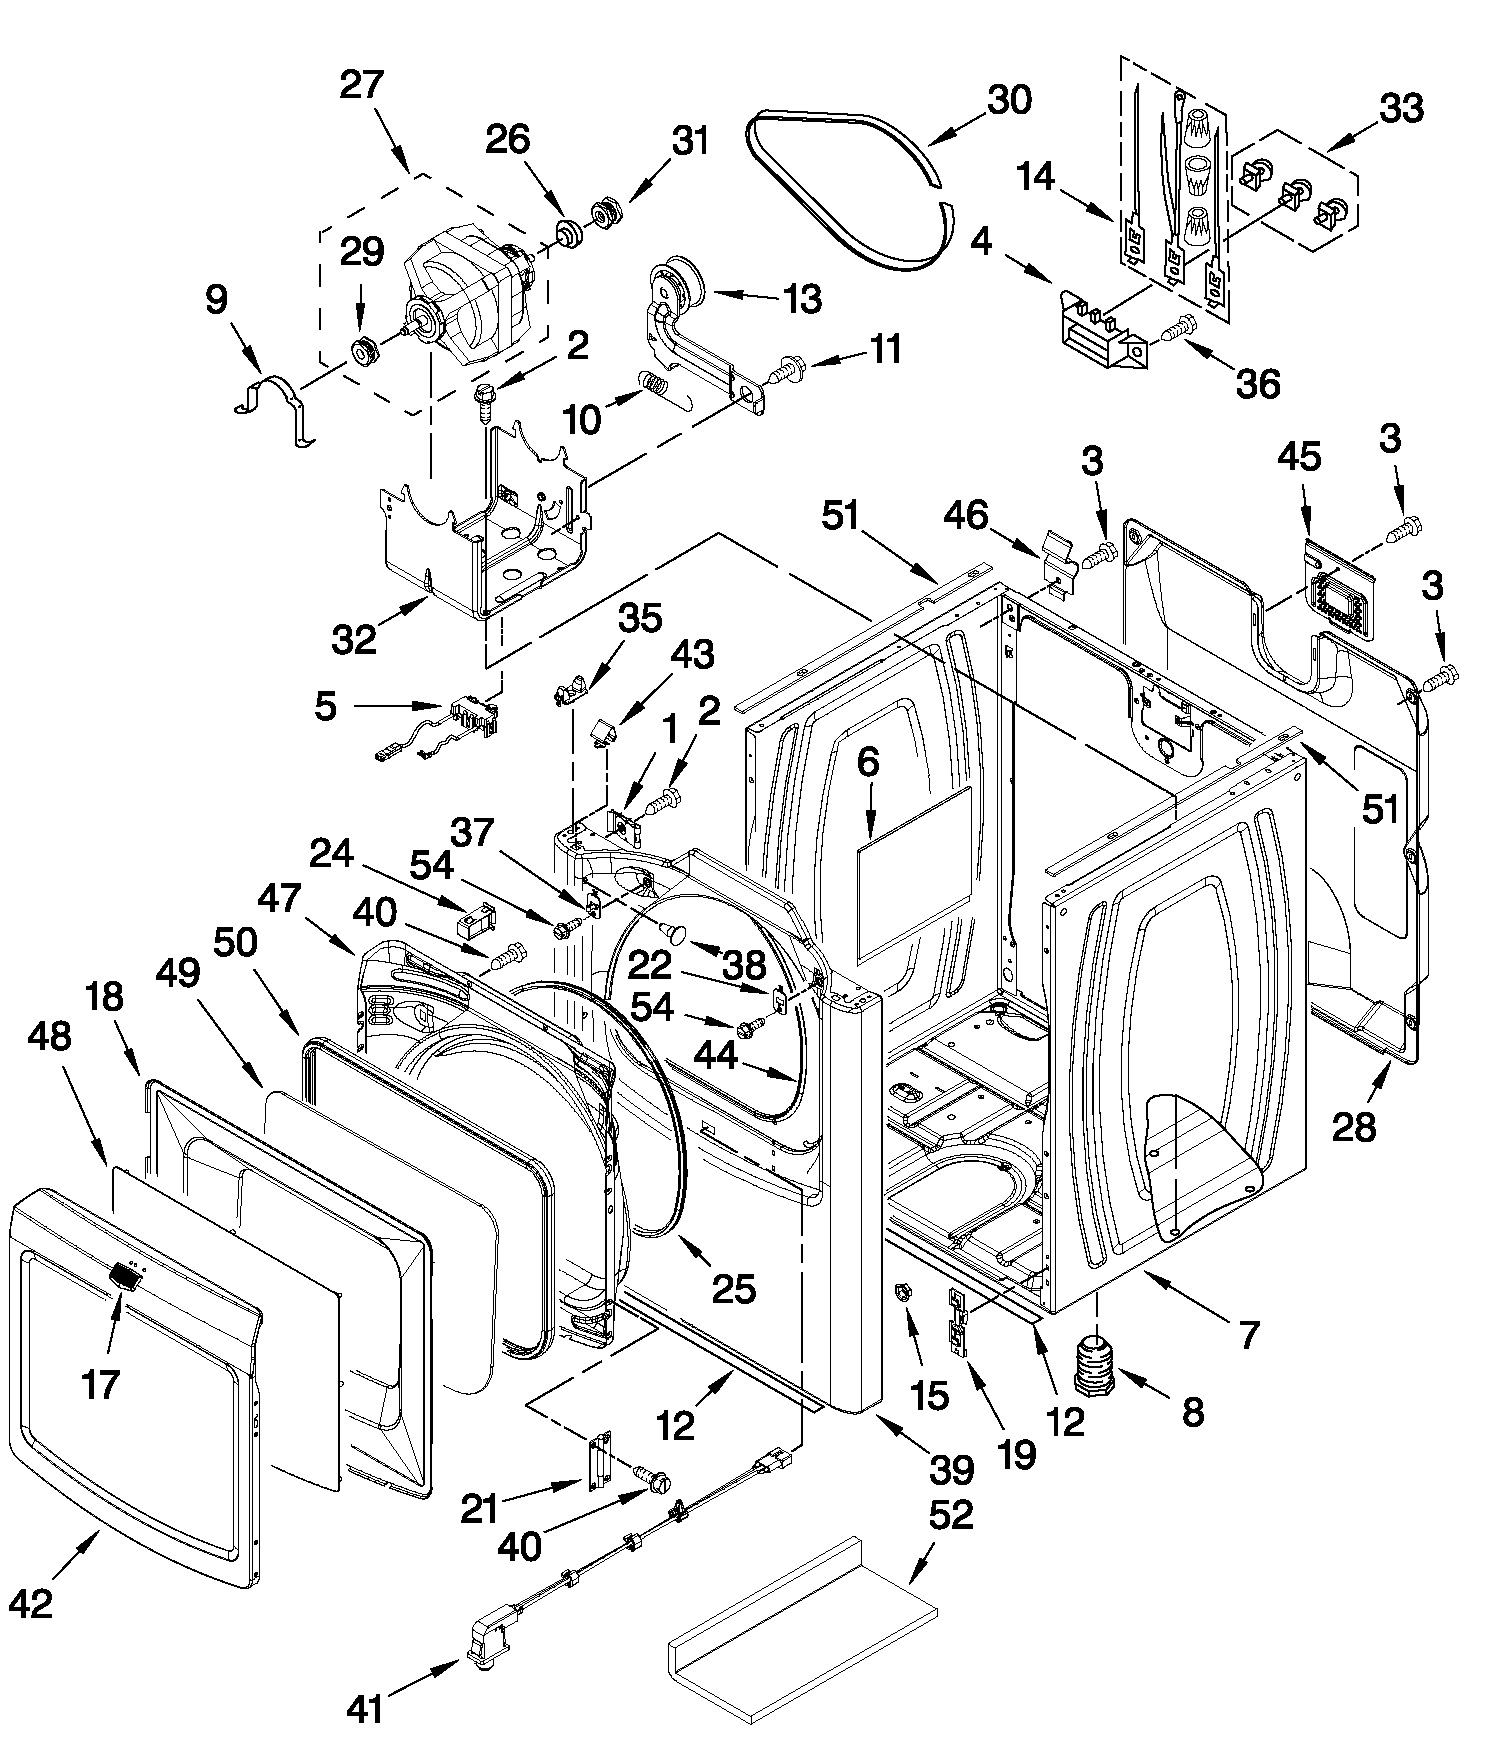 Maytag Centennial Dryer Wiring Diagram - Motherwill - Maytag Dryer Wiring Diagram